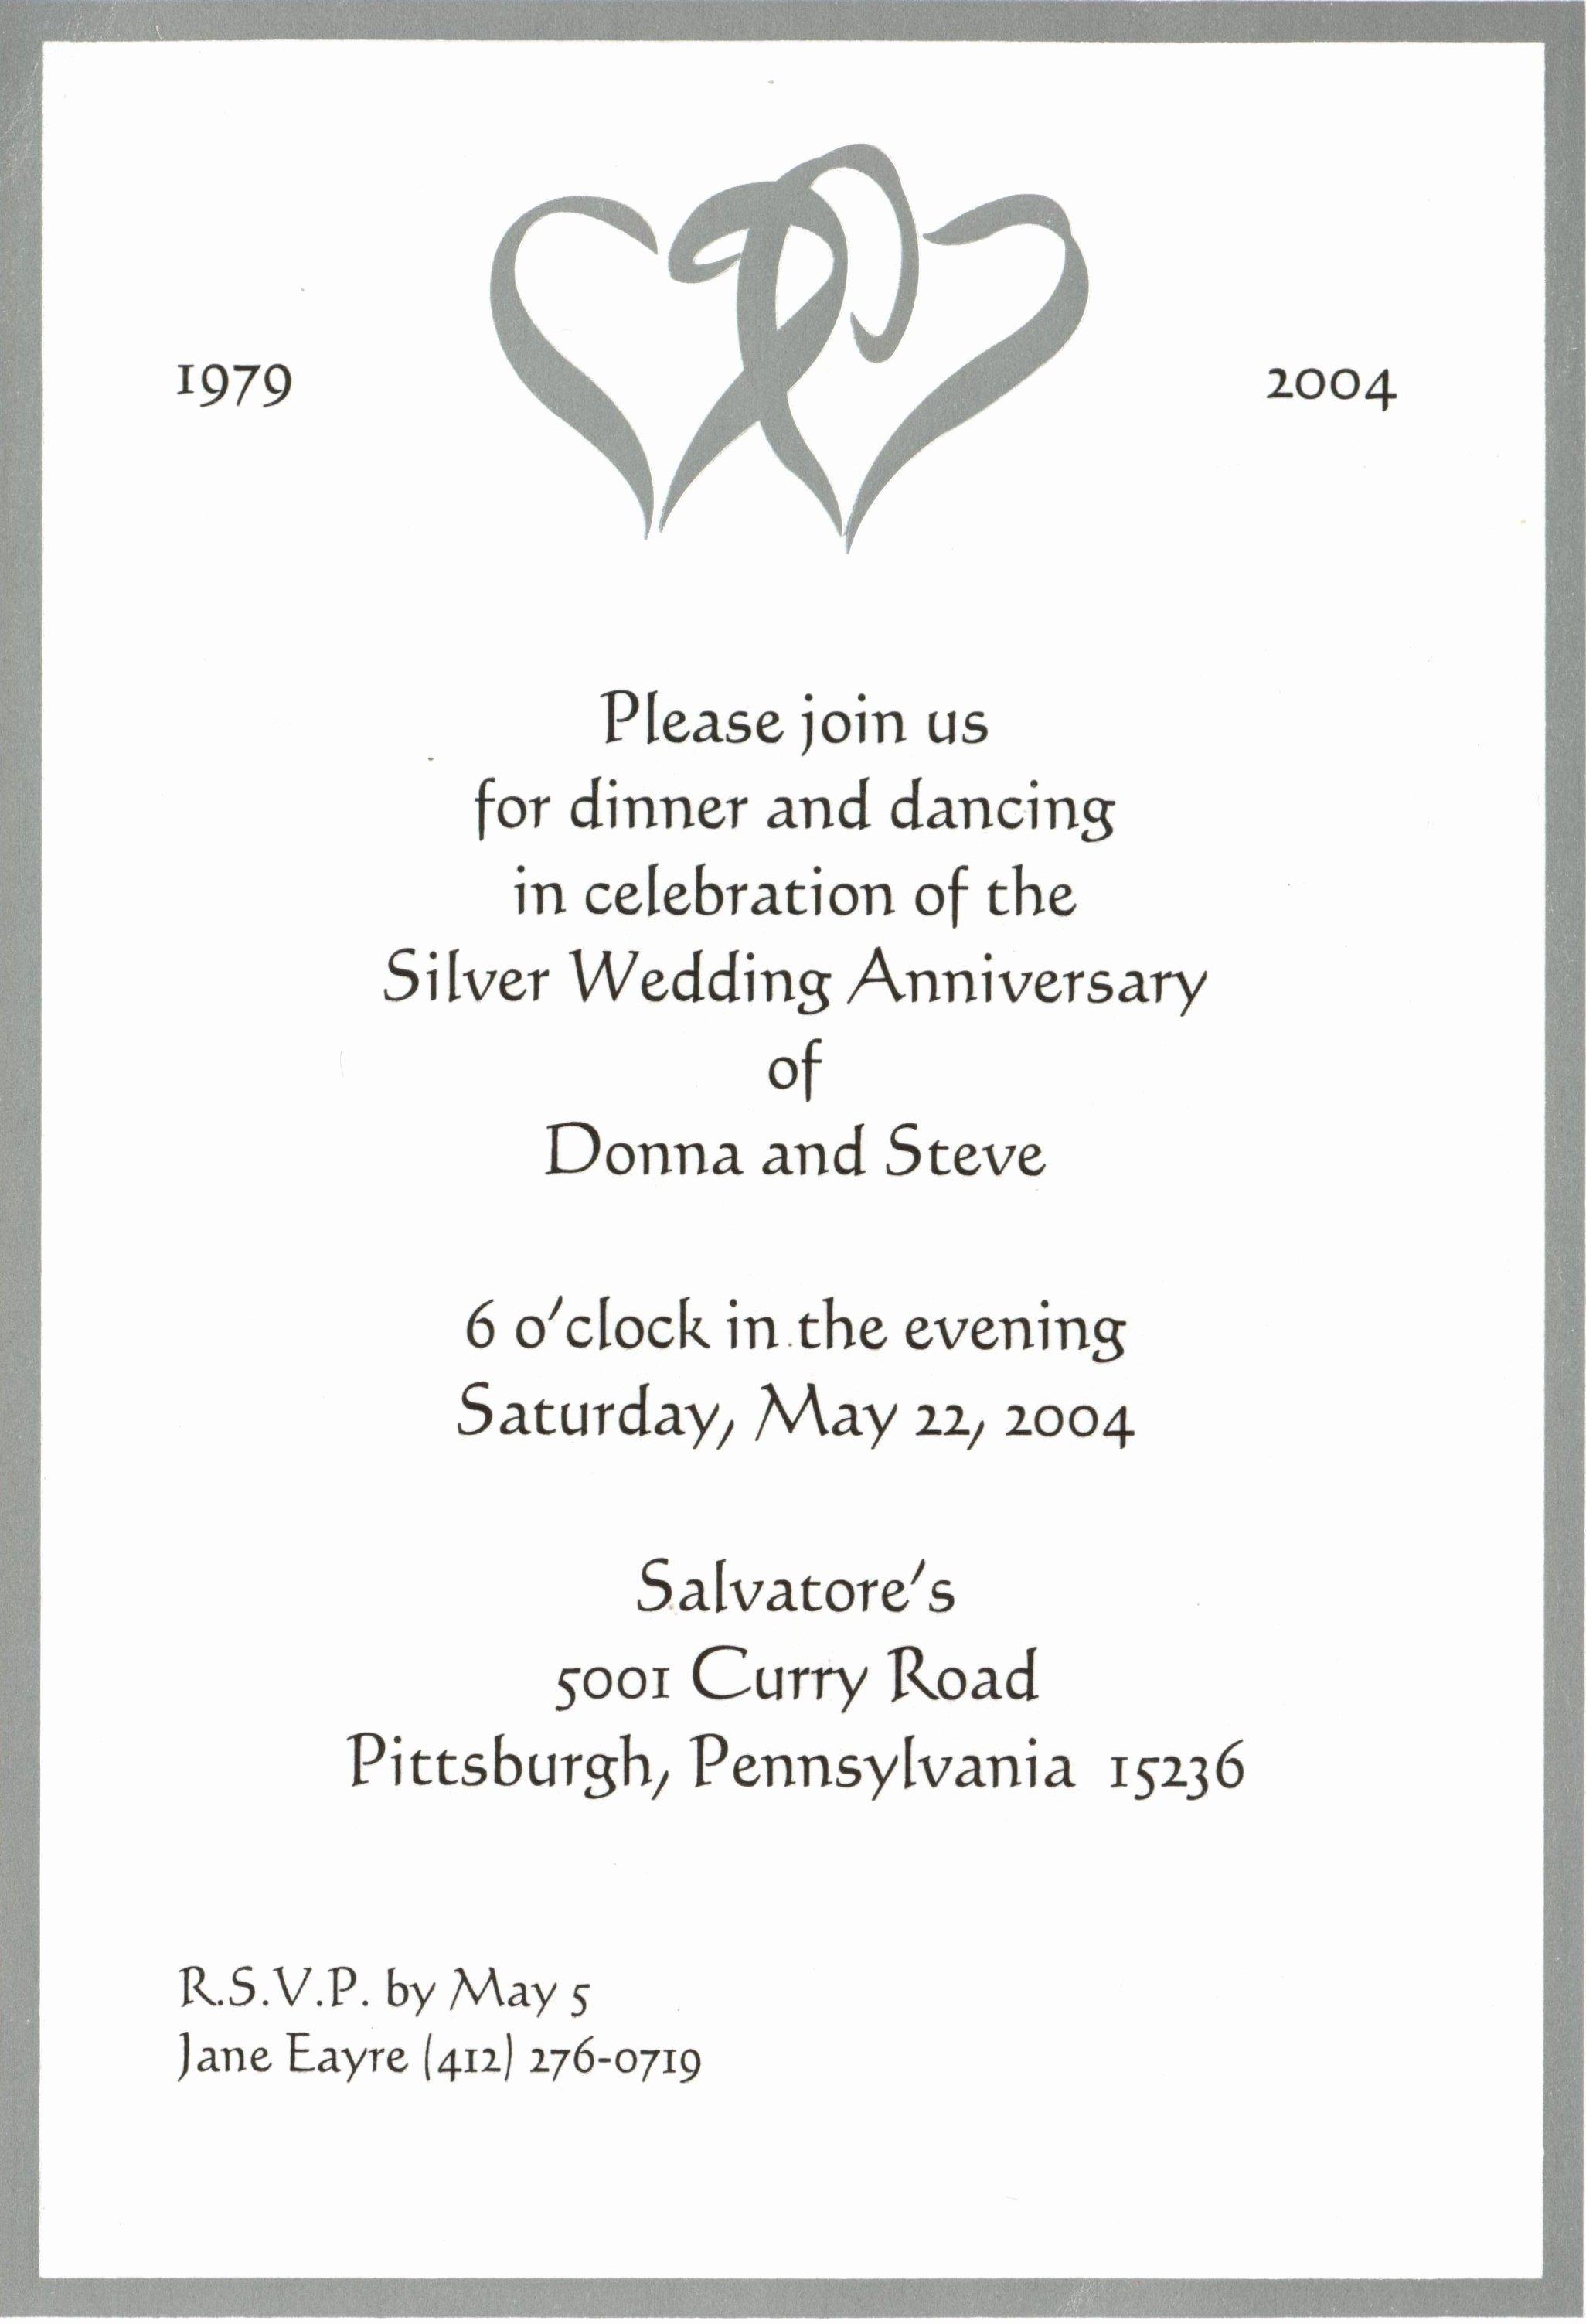 Wedding Anniversary Invitation Template Beautiful 50th Wedding Anniversary Invitation Templates Awesome